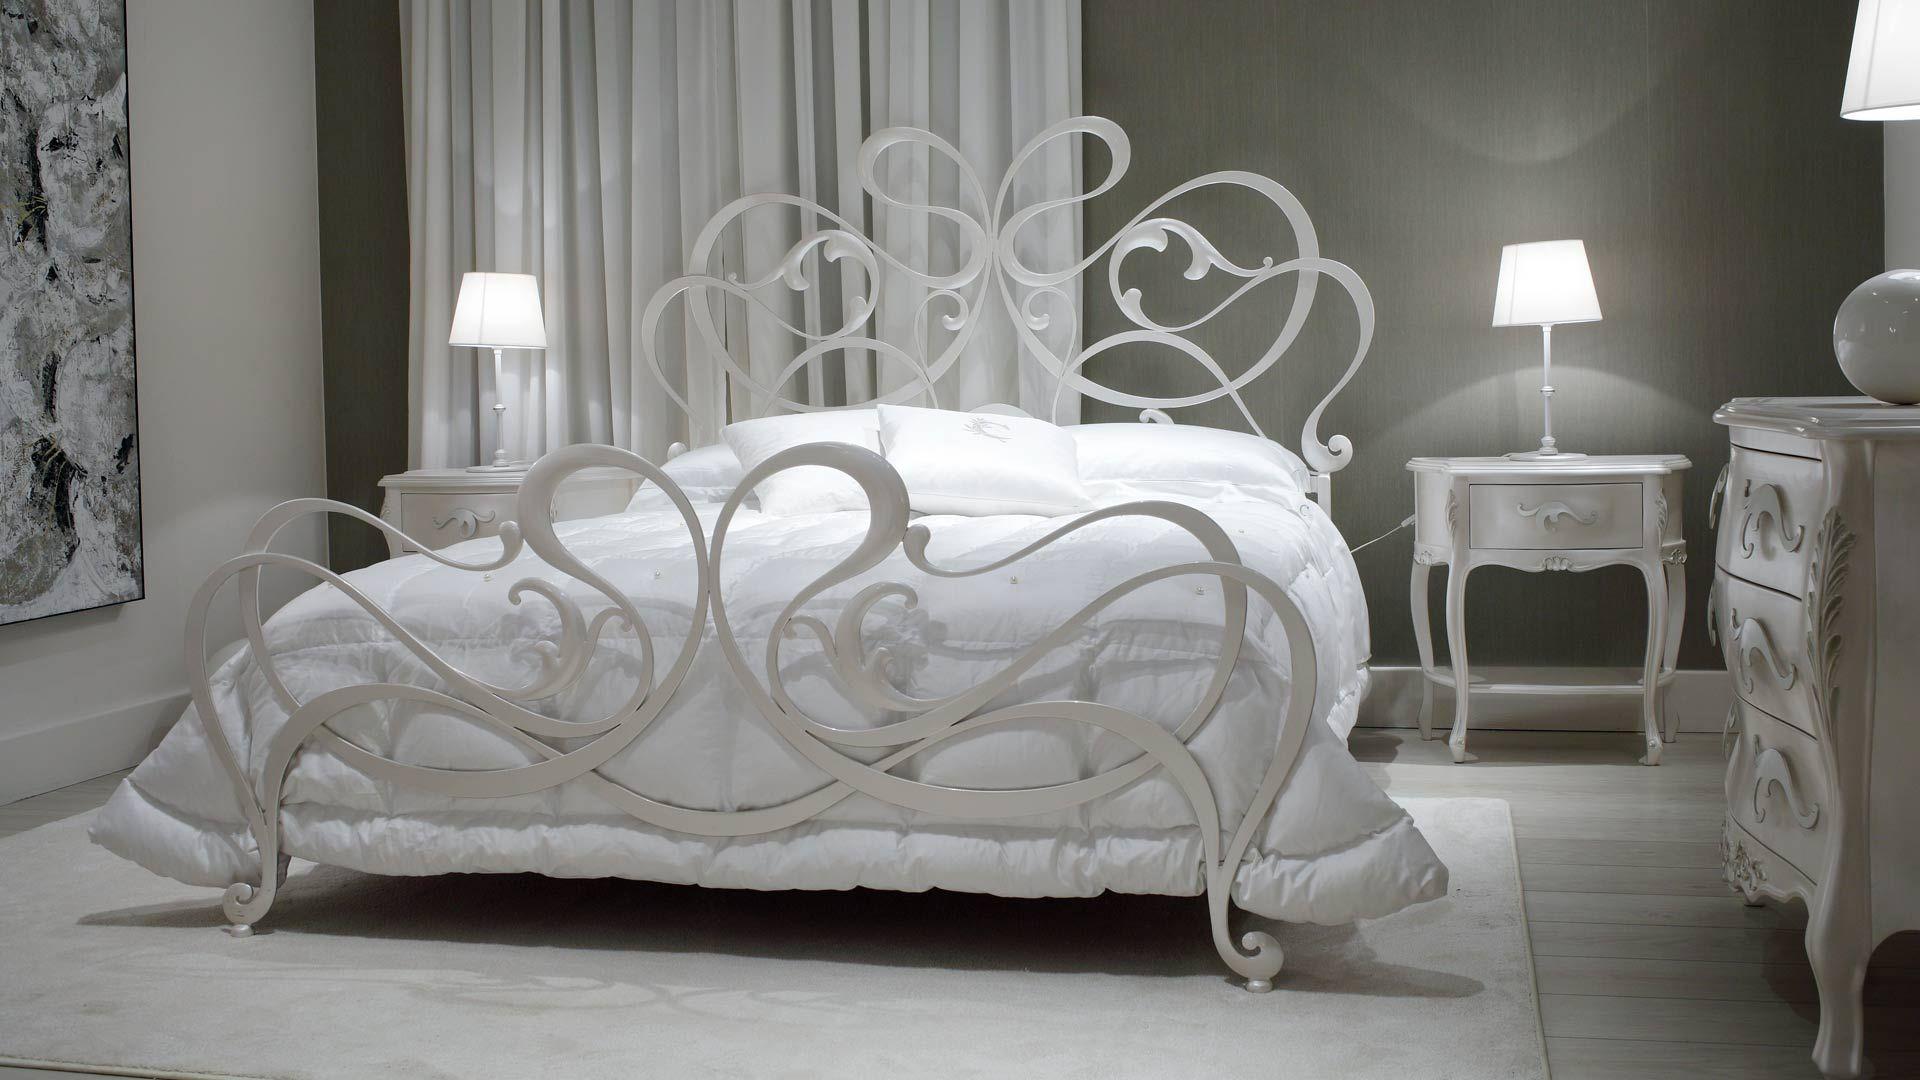 Rocco - Double beds - Cantori | Camera da letto ...